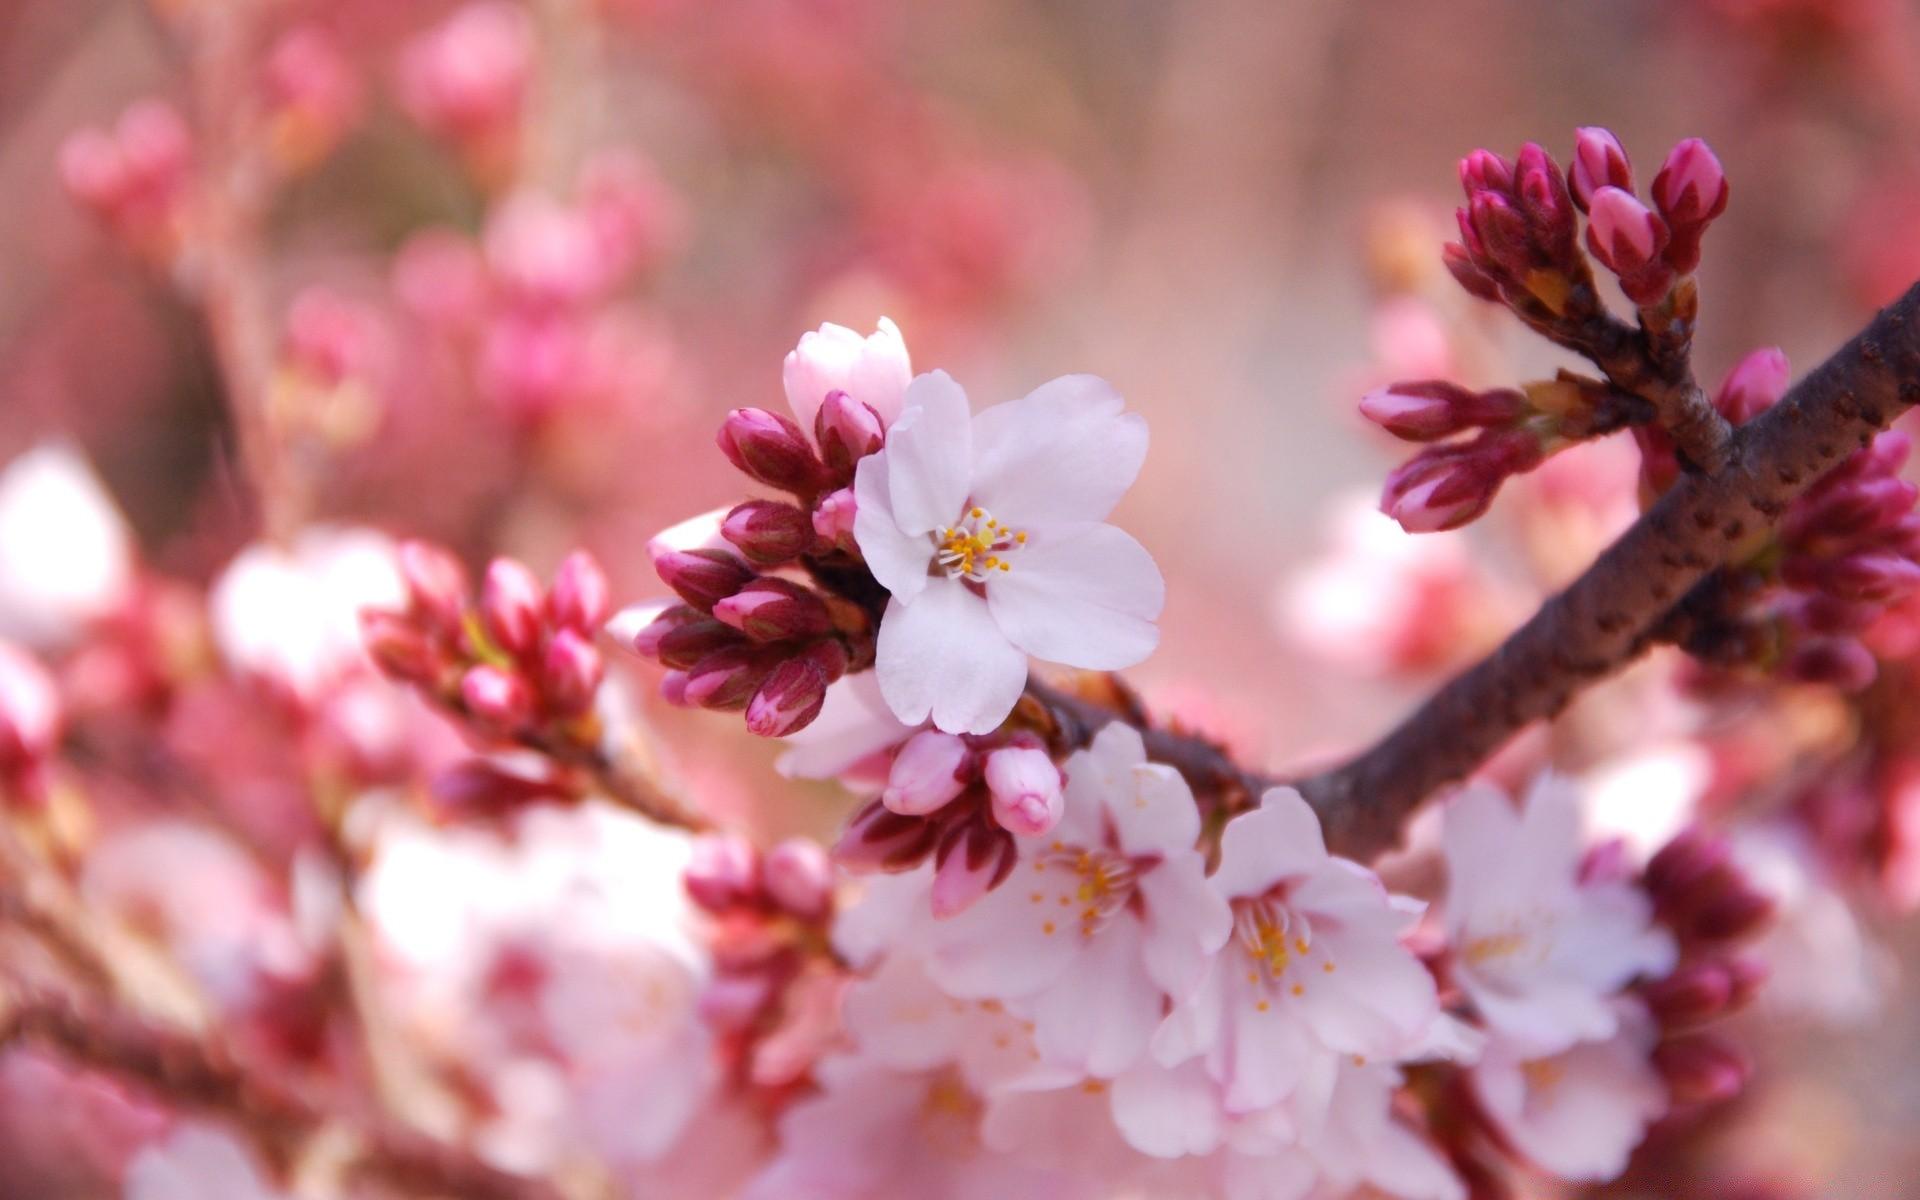 Девушки открытках, картинки цветущая вишня для телефона